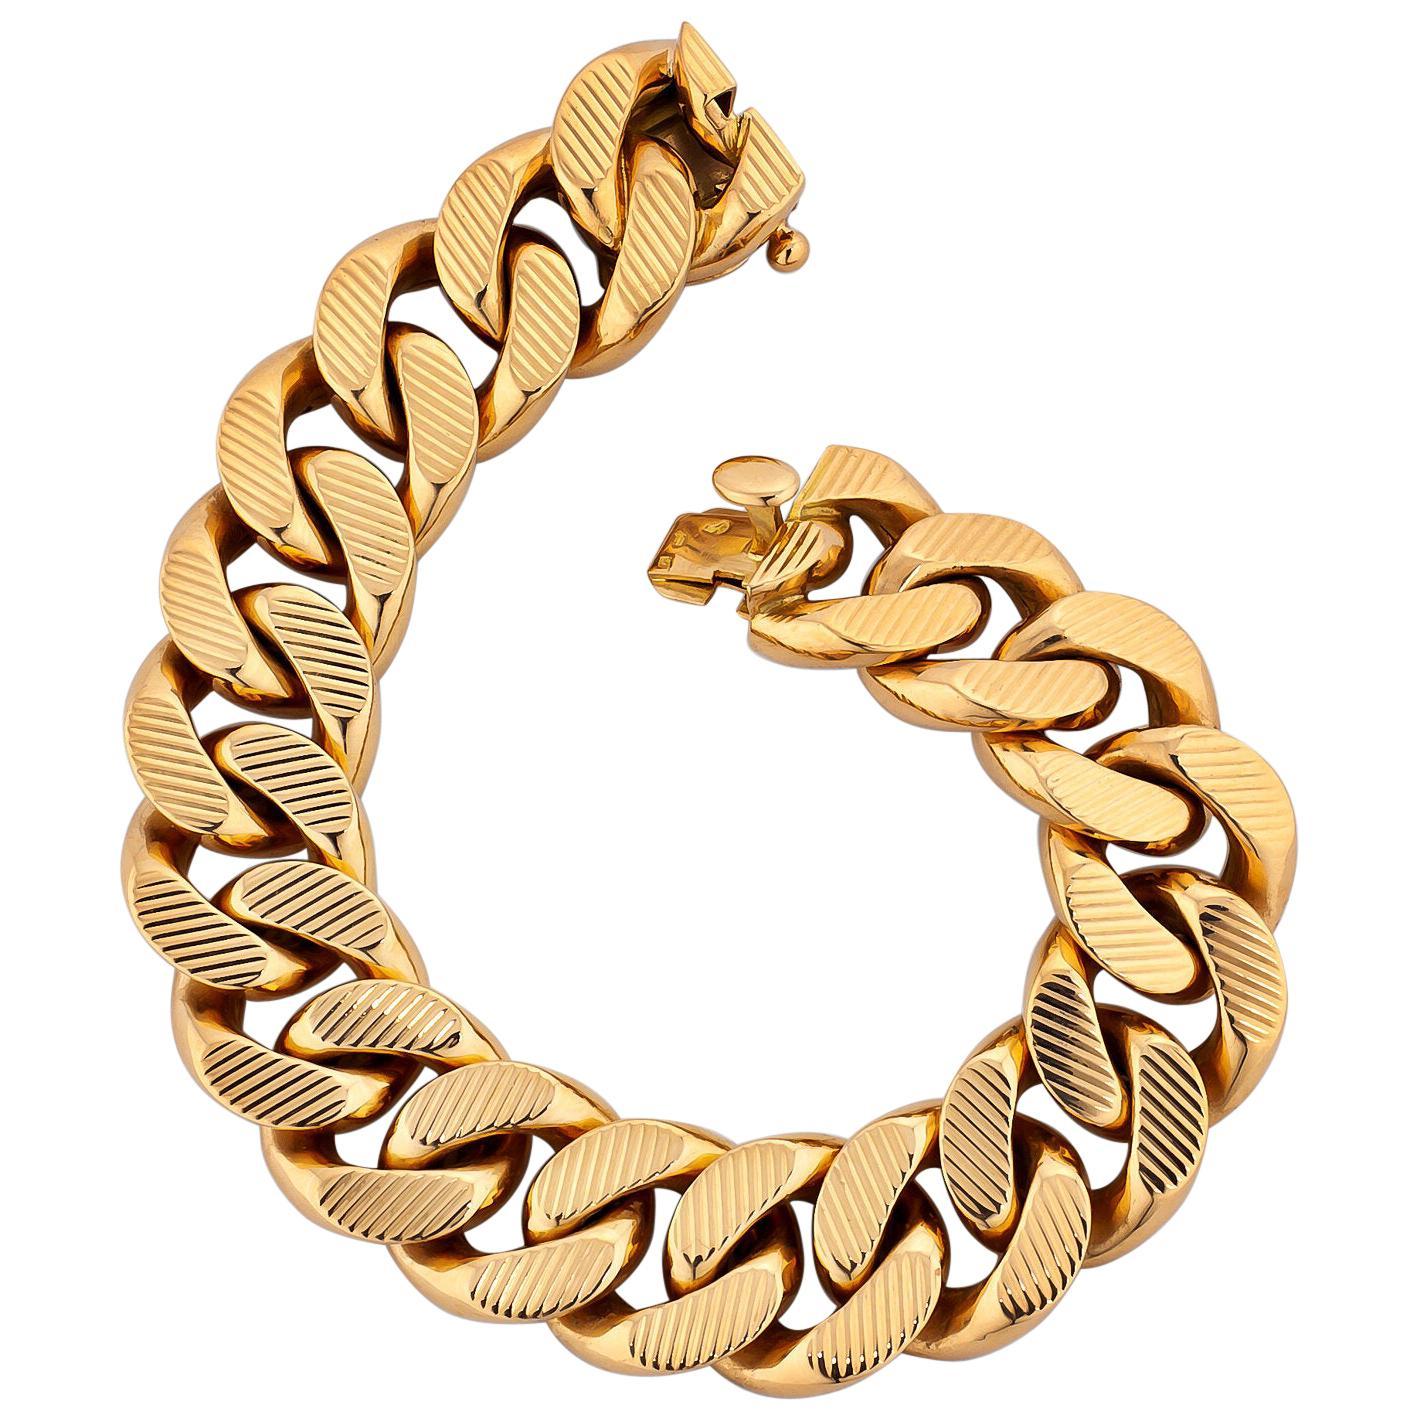 French Rose Gold Textured Curb Link Bracelet